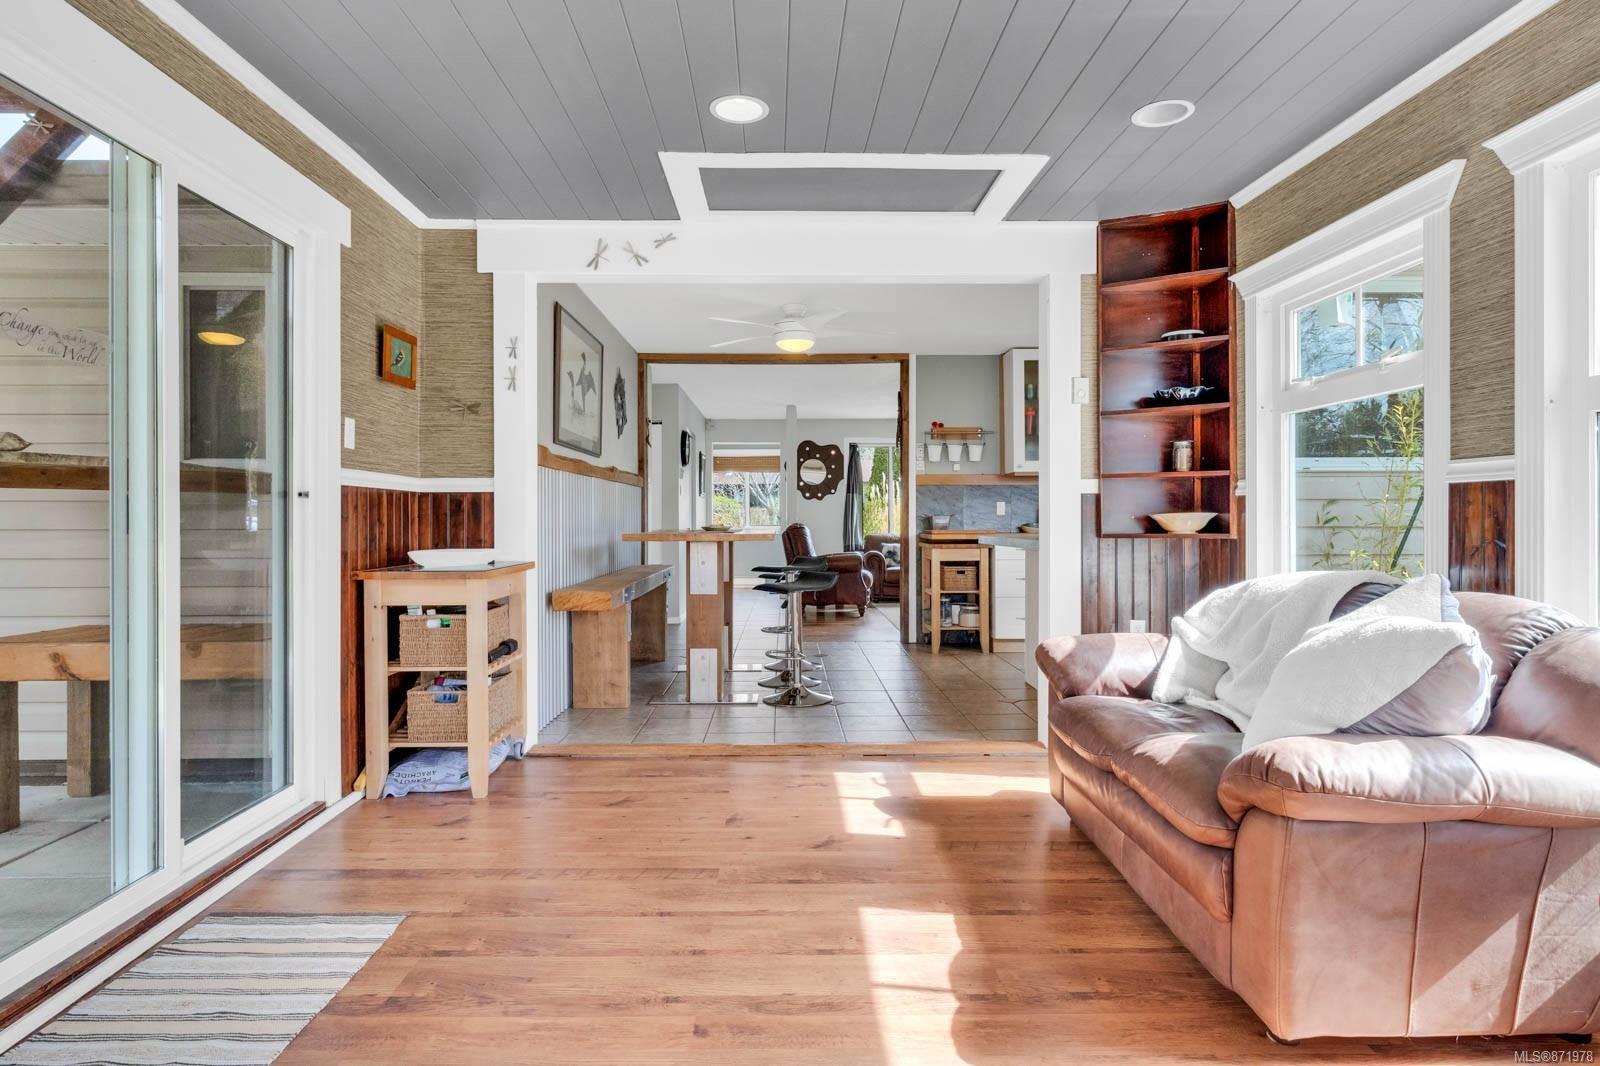 Photo 8: Photos: 1539 Chilcotin Cres in : CV Comox (Town of) House for sale (Comox Valley)  : MLS®# 871978